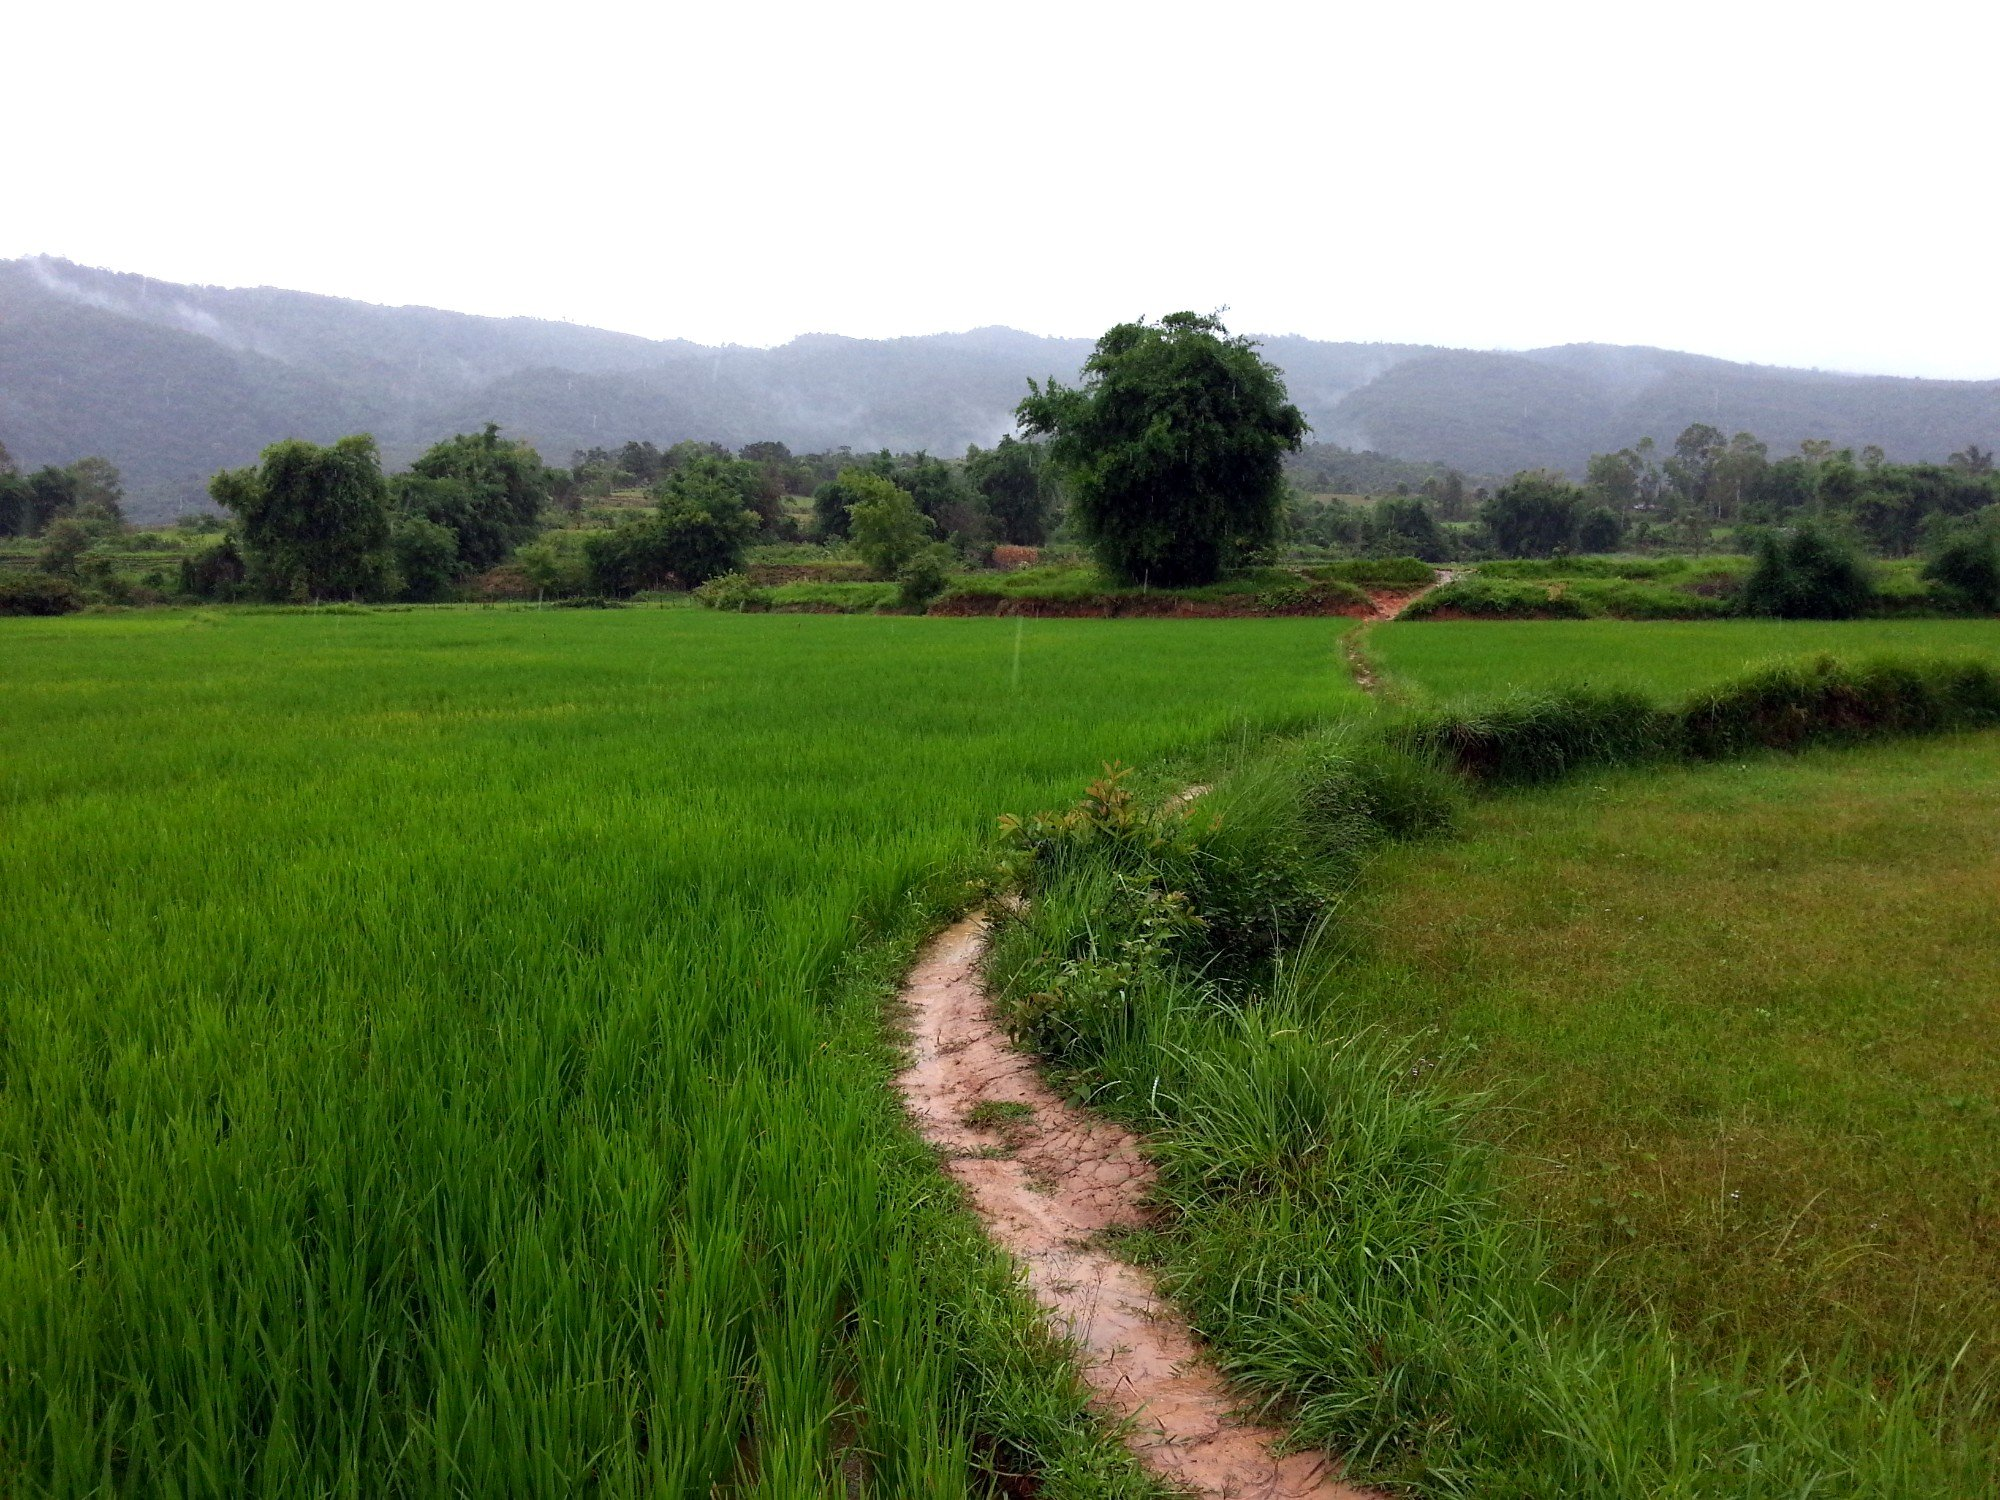 Muddy path to Jar Site 3